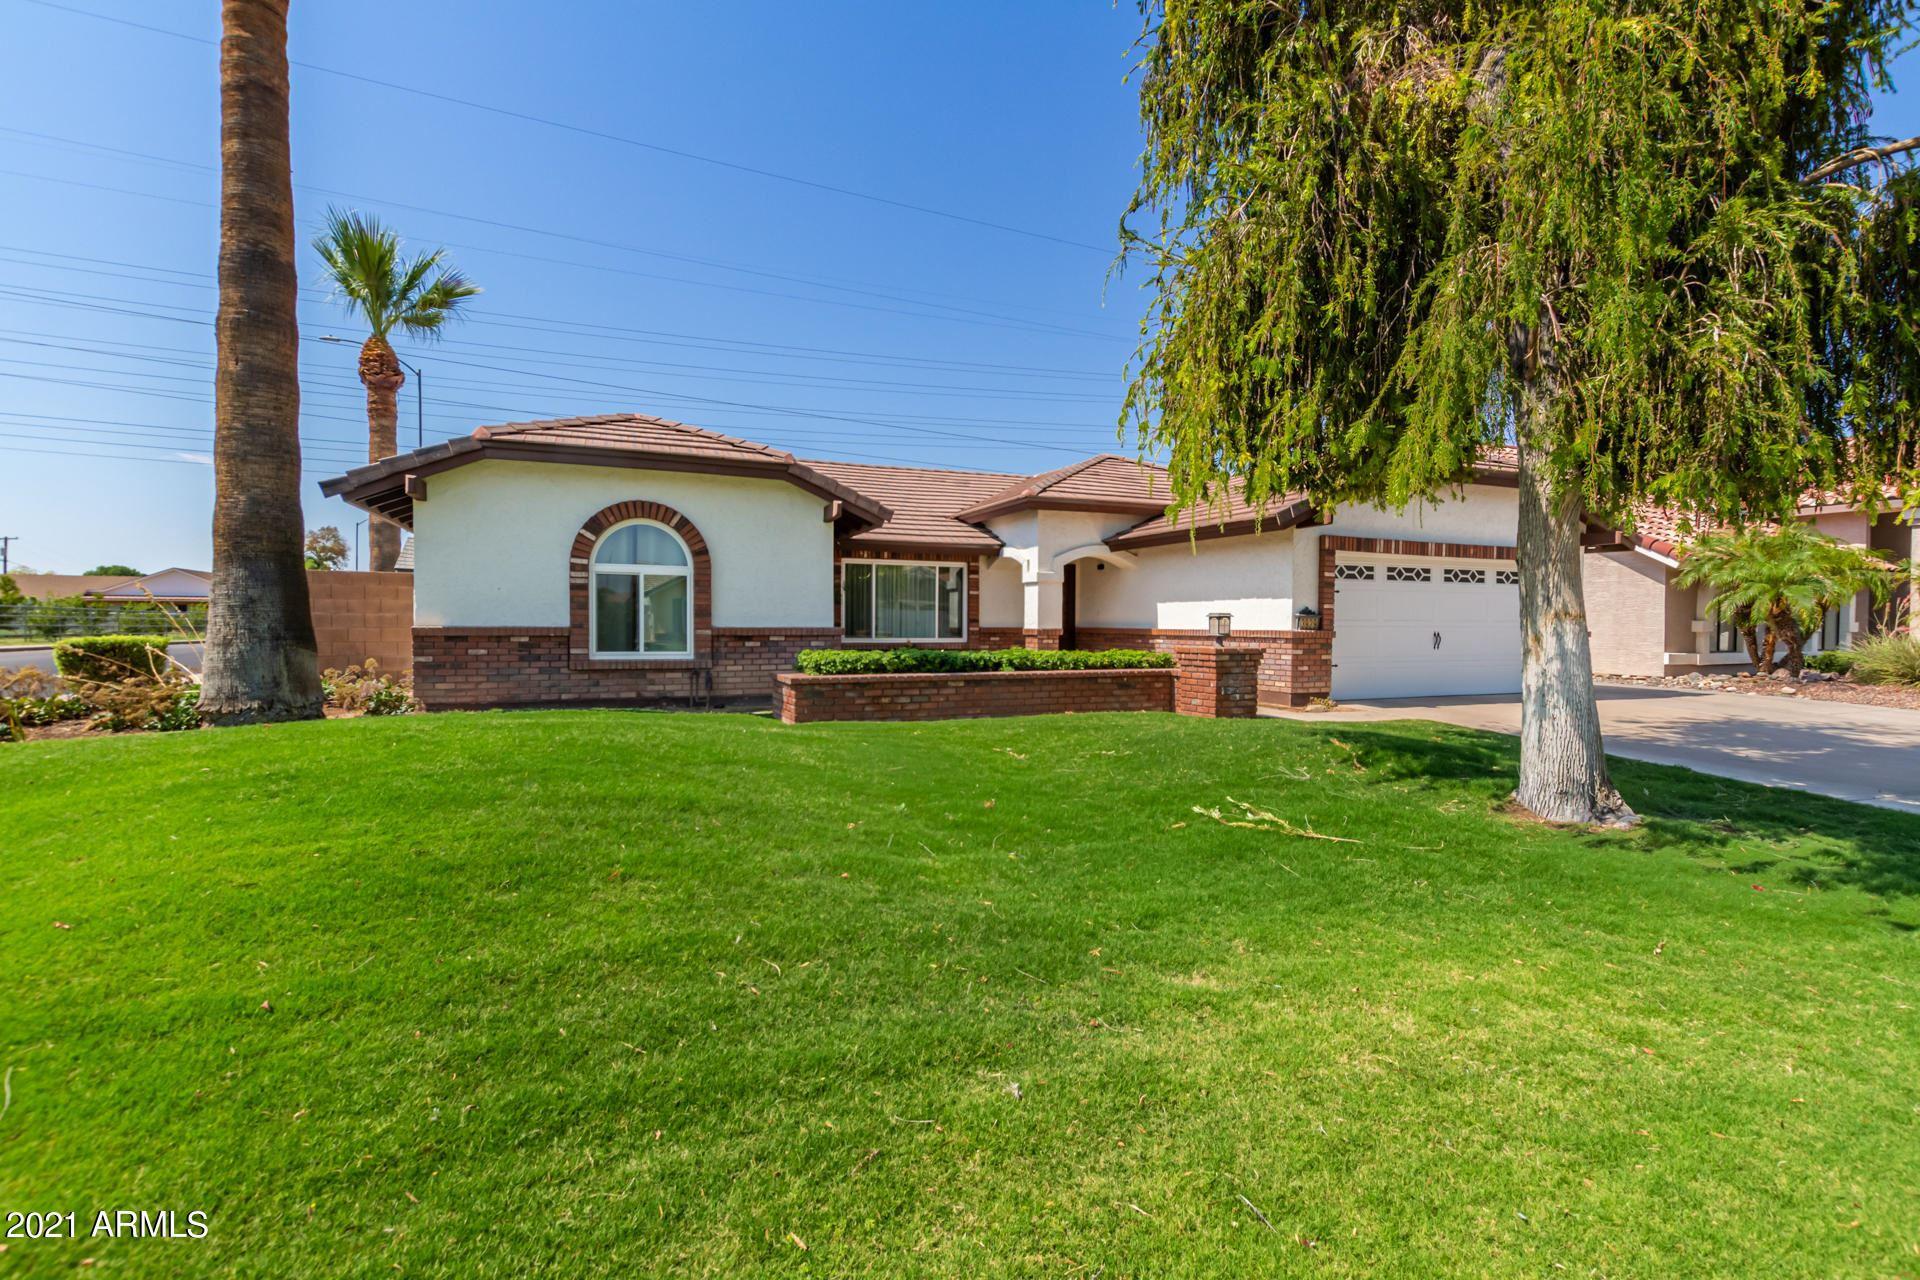 3929 E DECATUR Street, Mesa, AZ 85205 - MLS#: 6259369